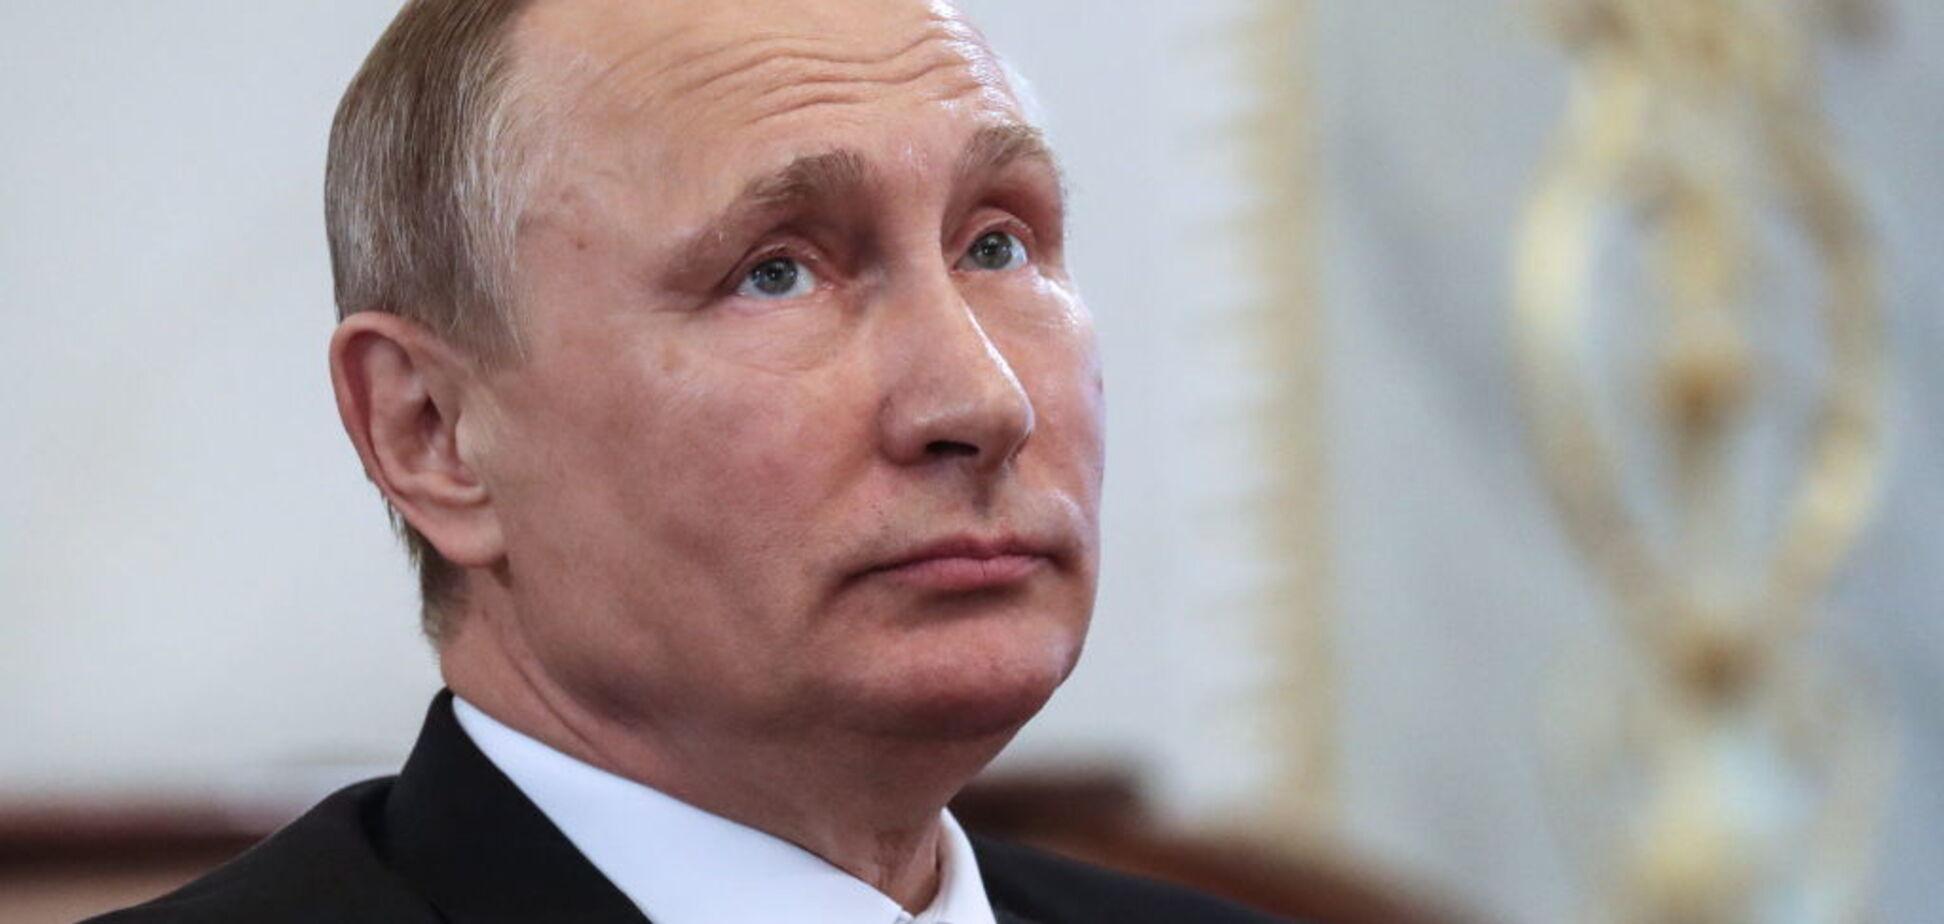 ''Никто и не заметил'': игнор Путина на G20 высмеяли в карикатуре